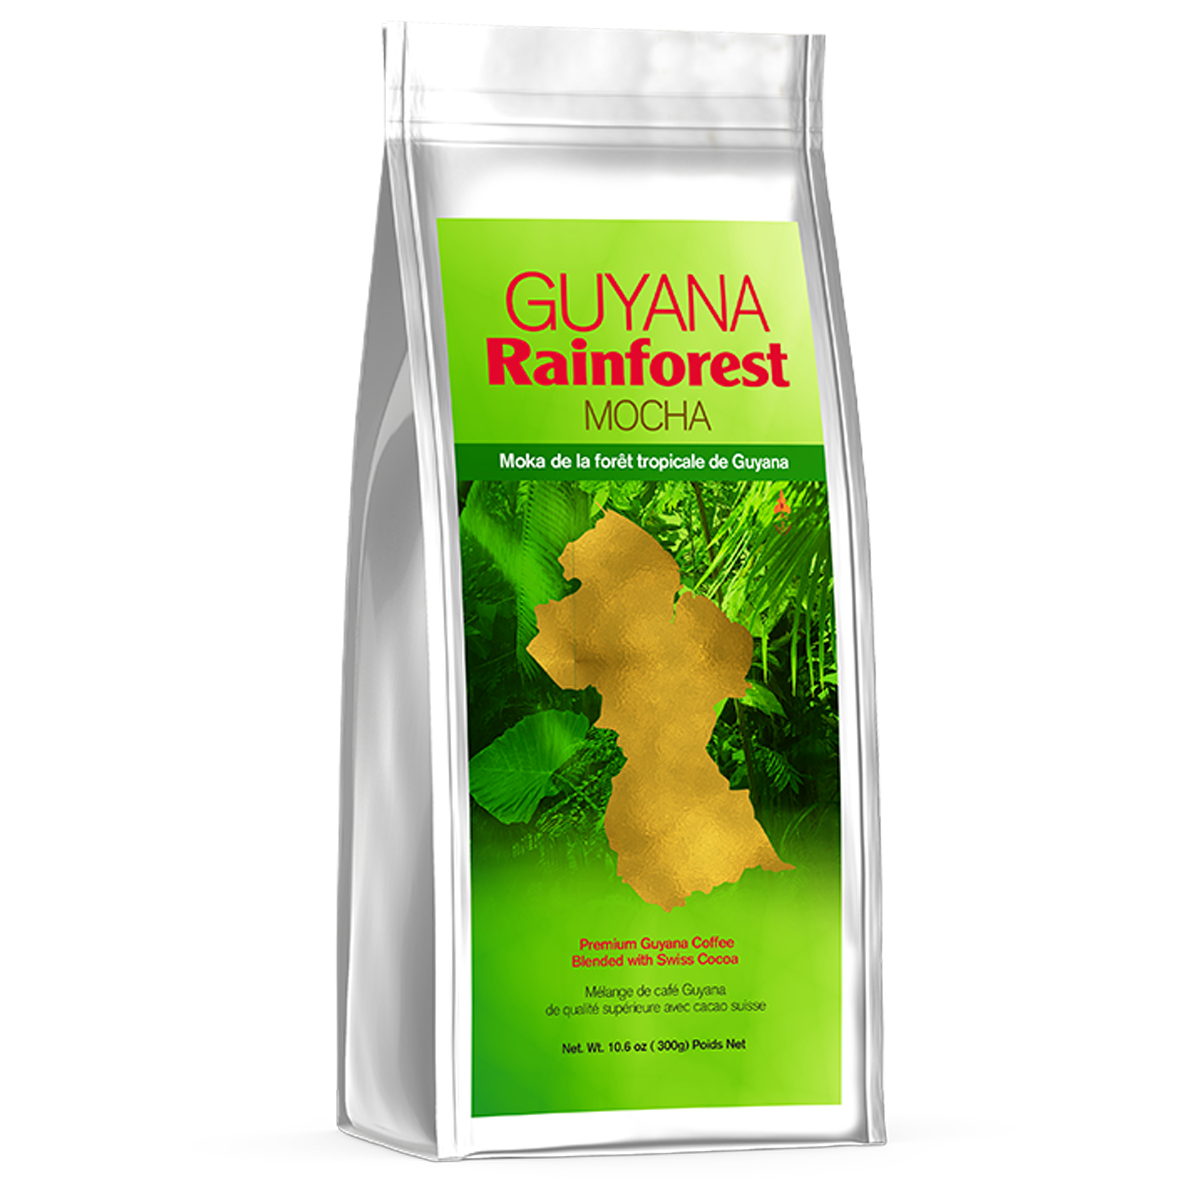 Guyana Rainforest Mocha